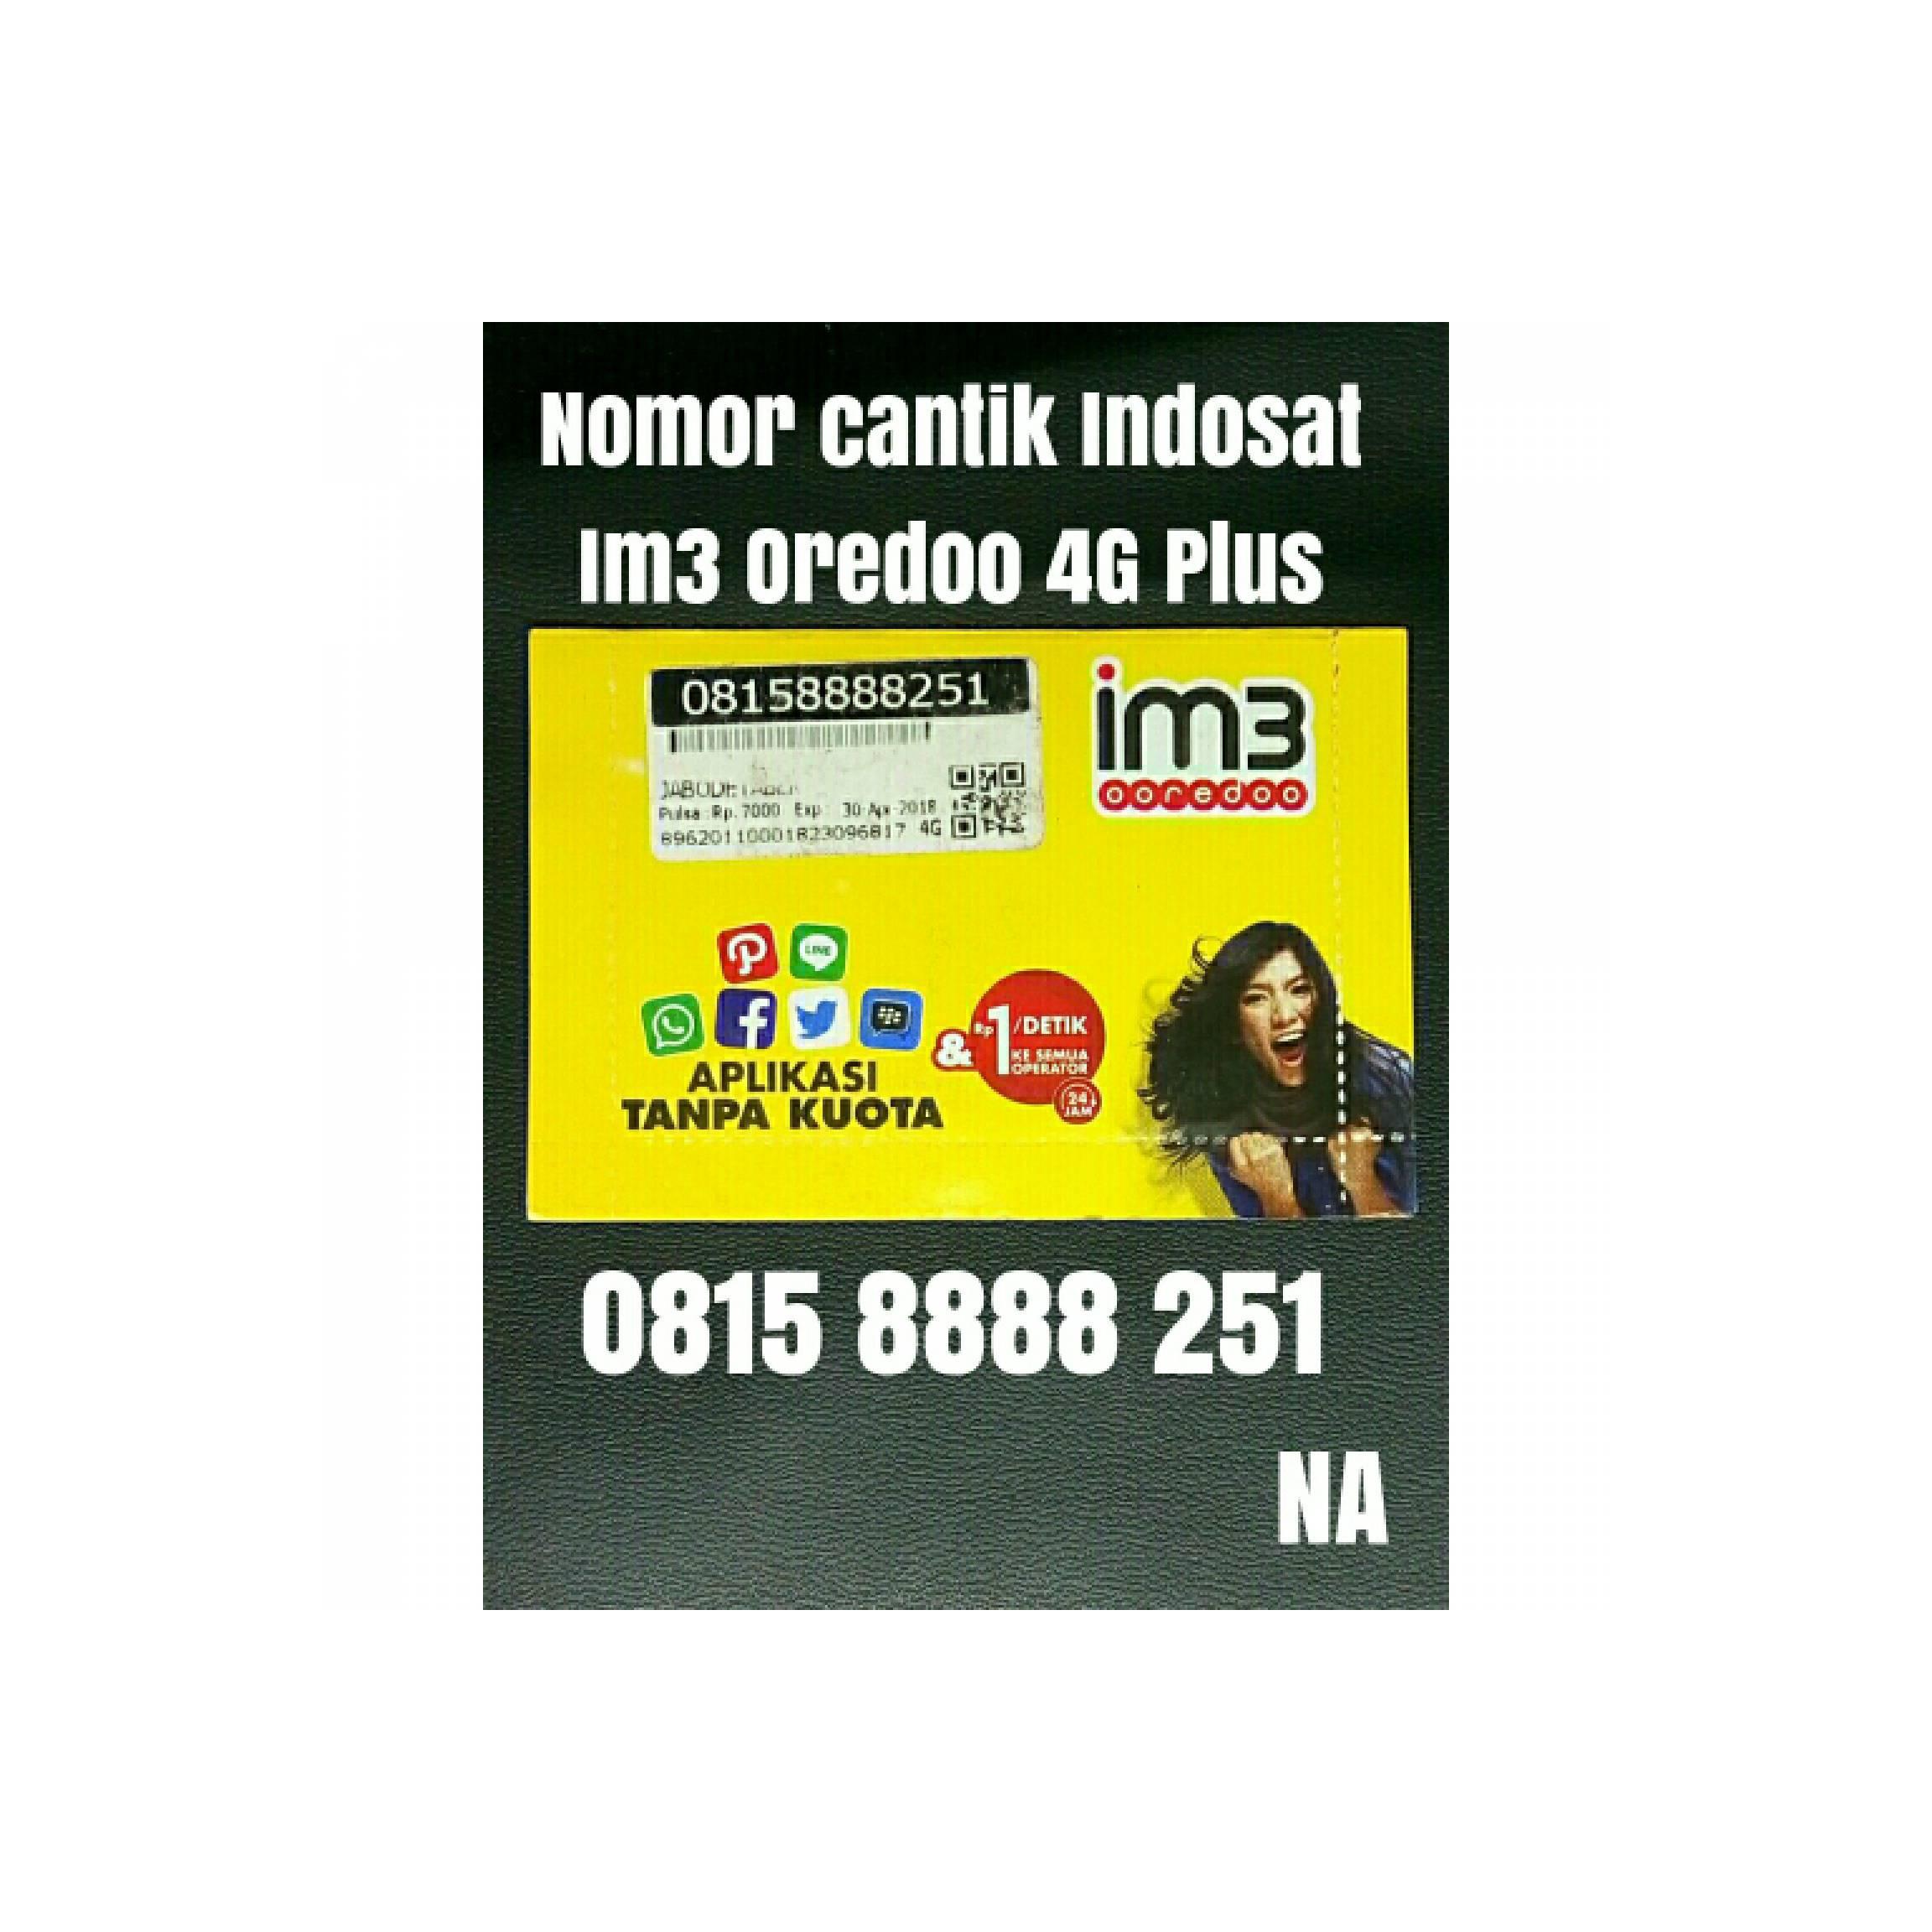 nomor cantik nomer indosat ooredoo 4G kartu perdana 11 digit 8251 .